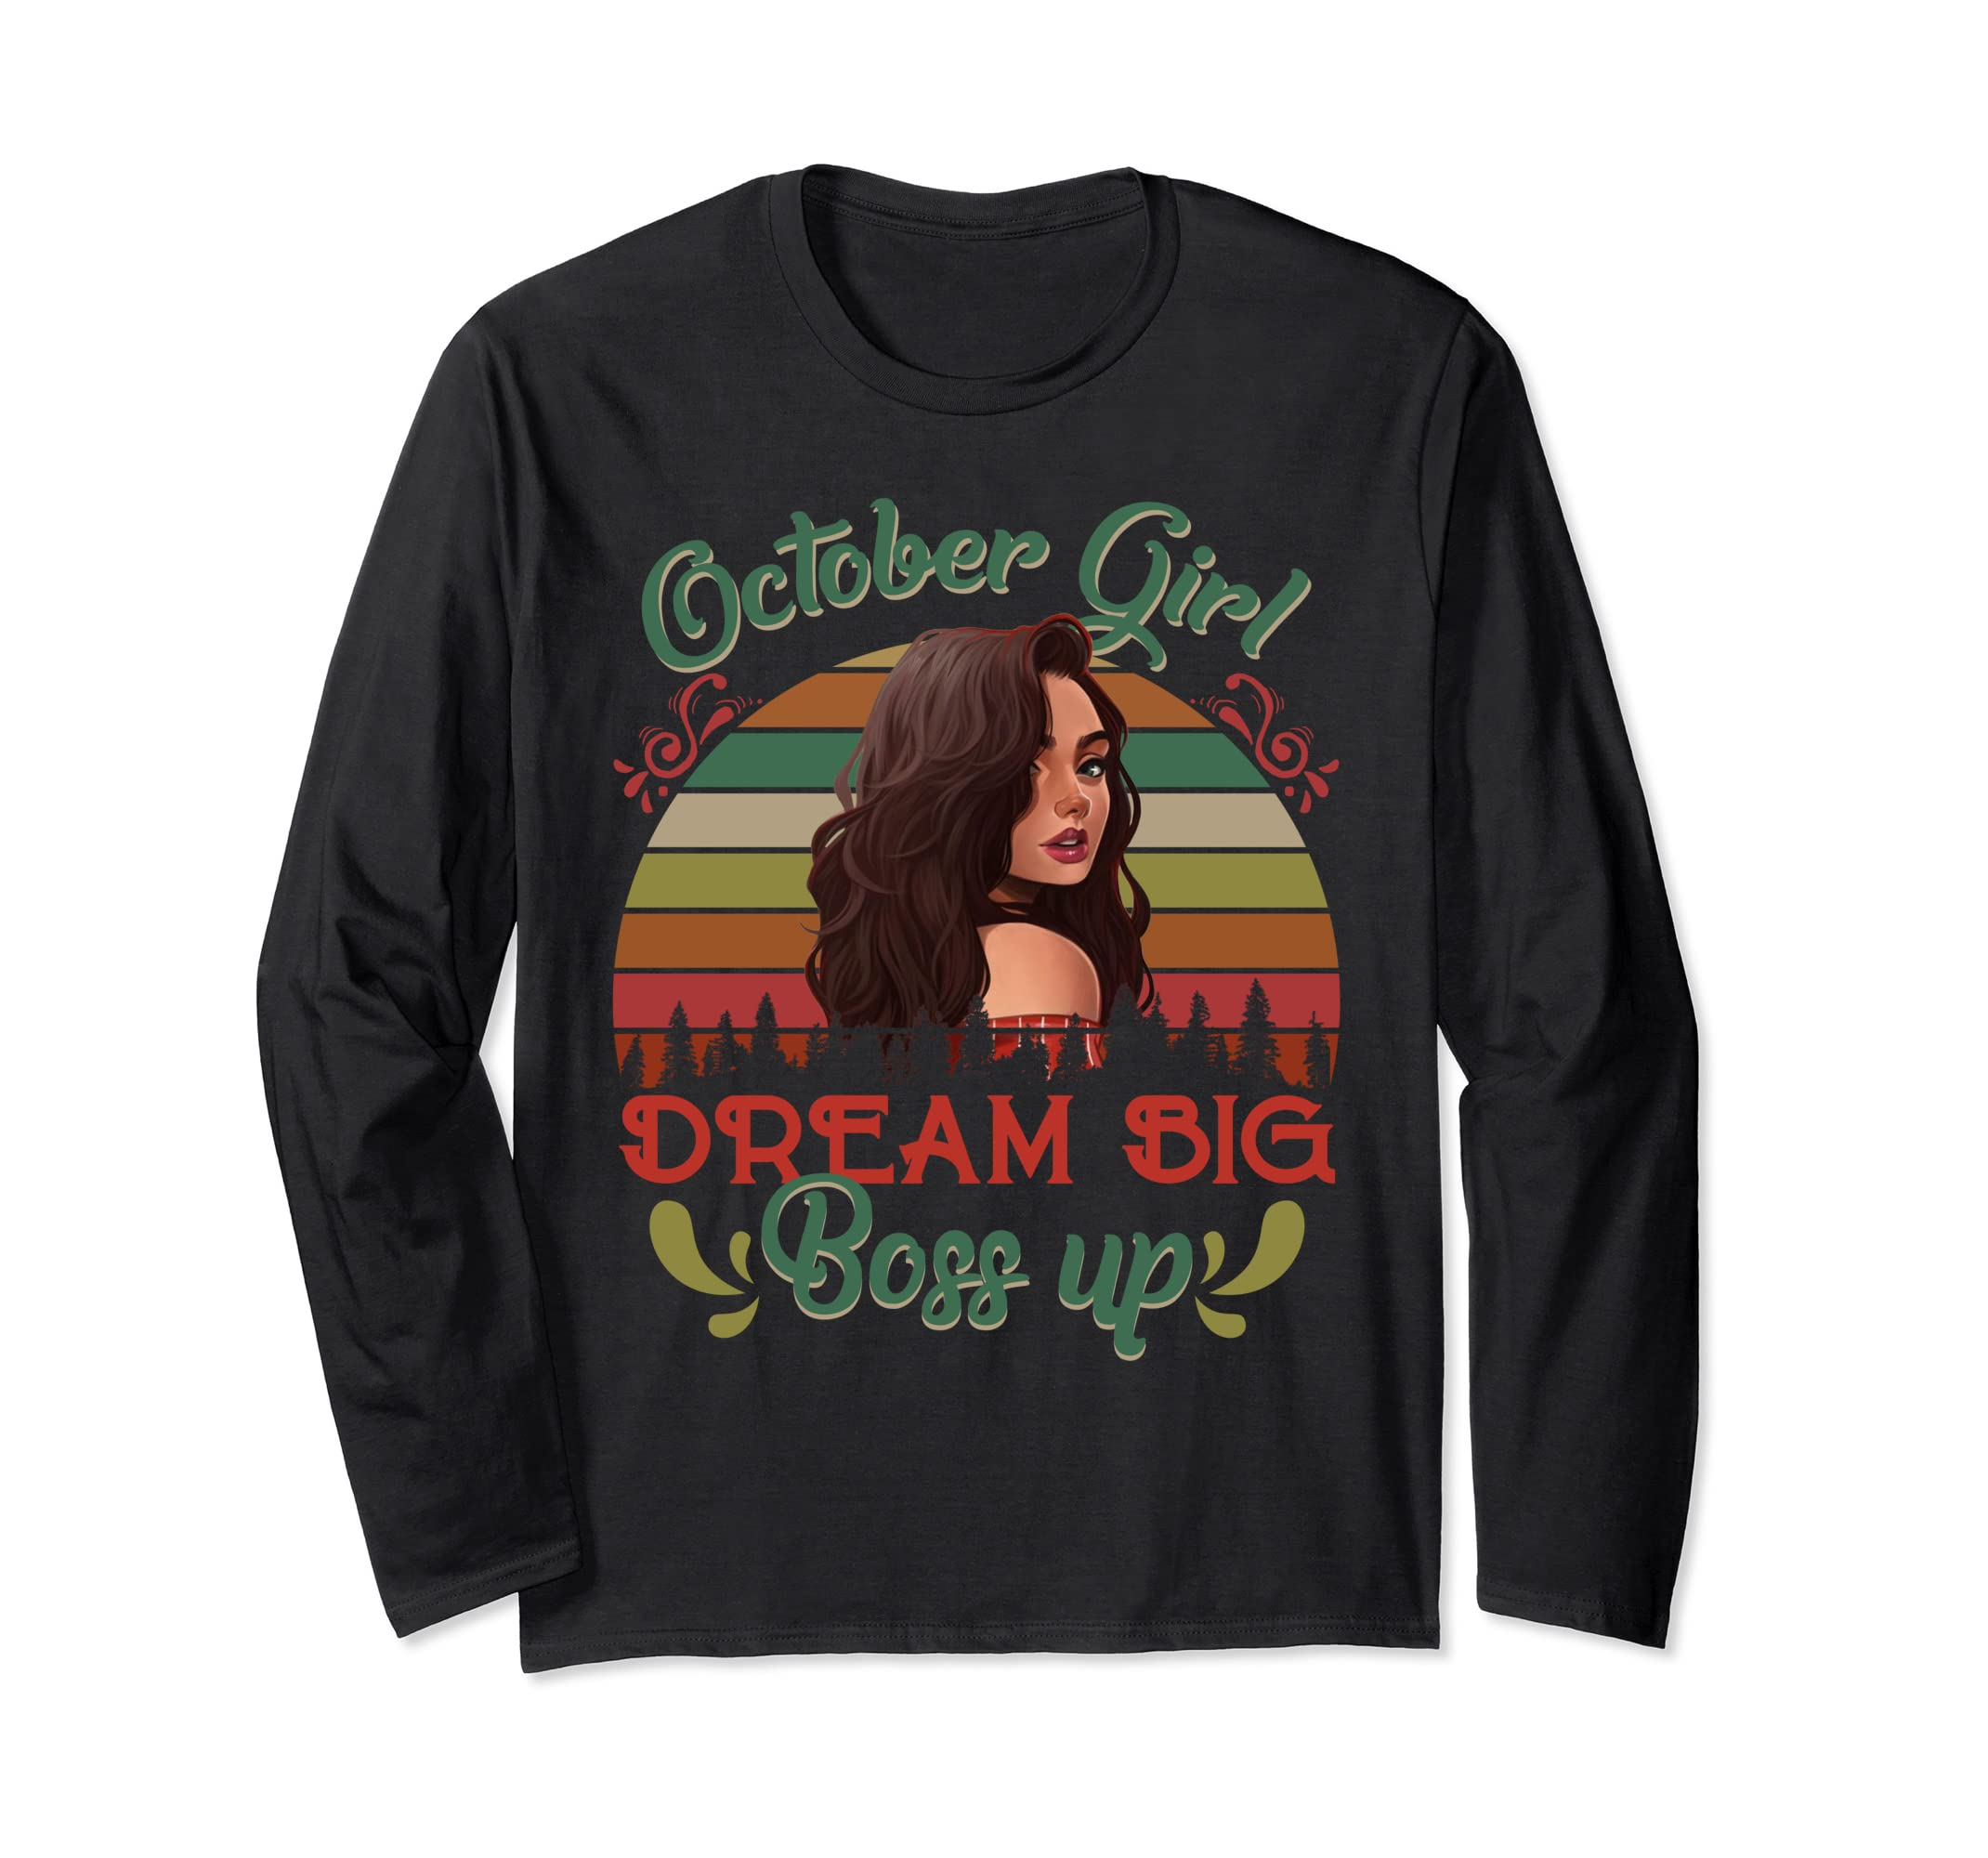 19acdd671 Amazon.com: October Girl Dream Big Boss Up Long Sleeve Shirt Retro Bir:  Clothing